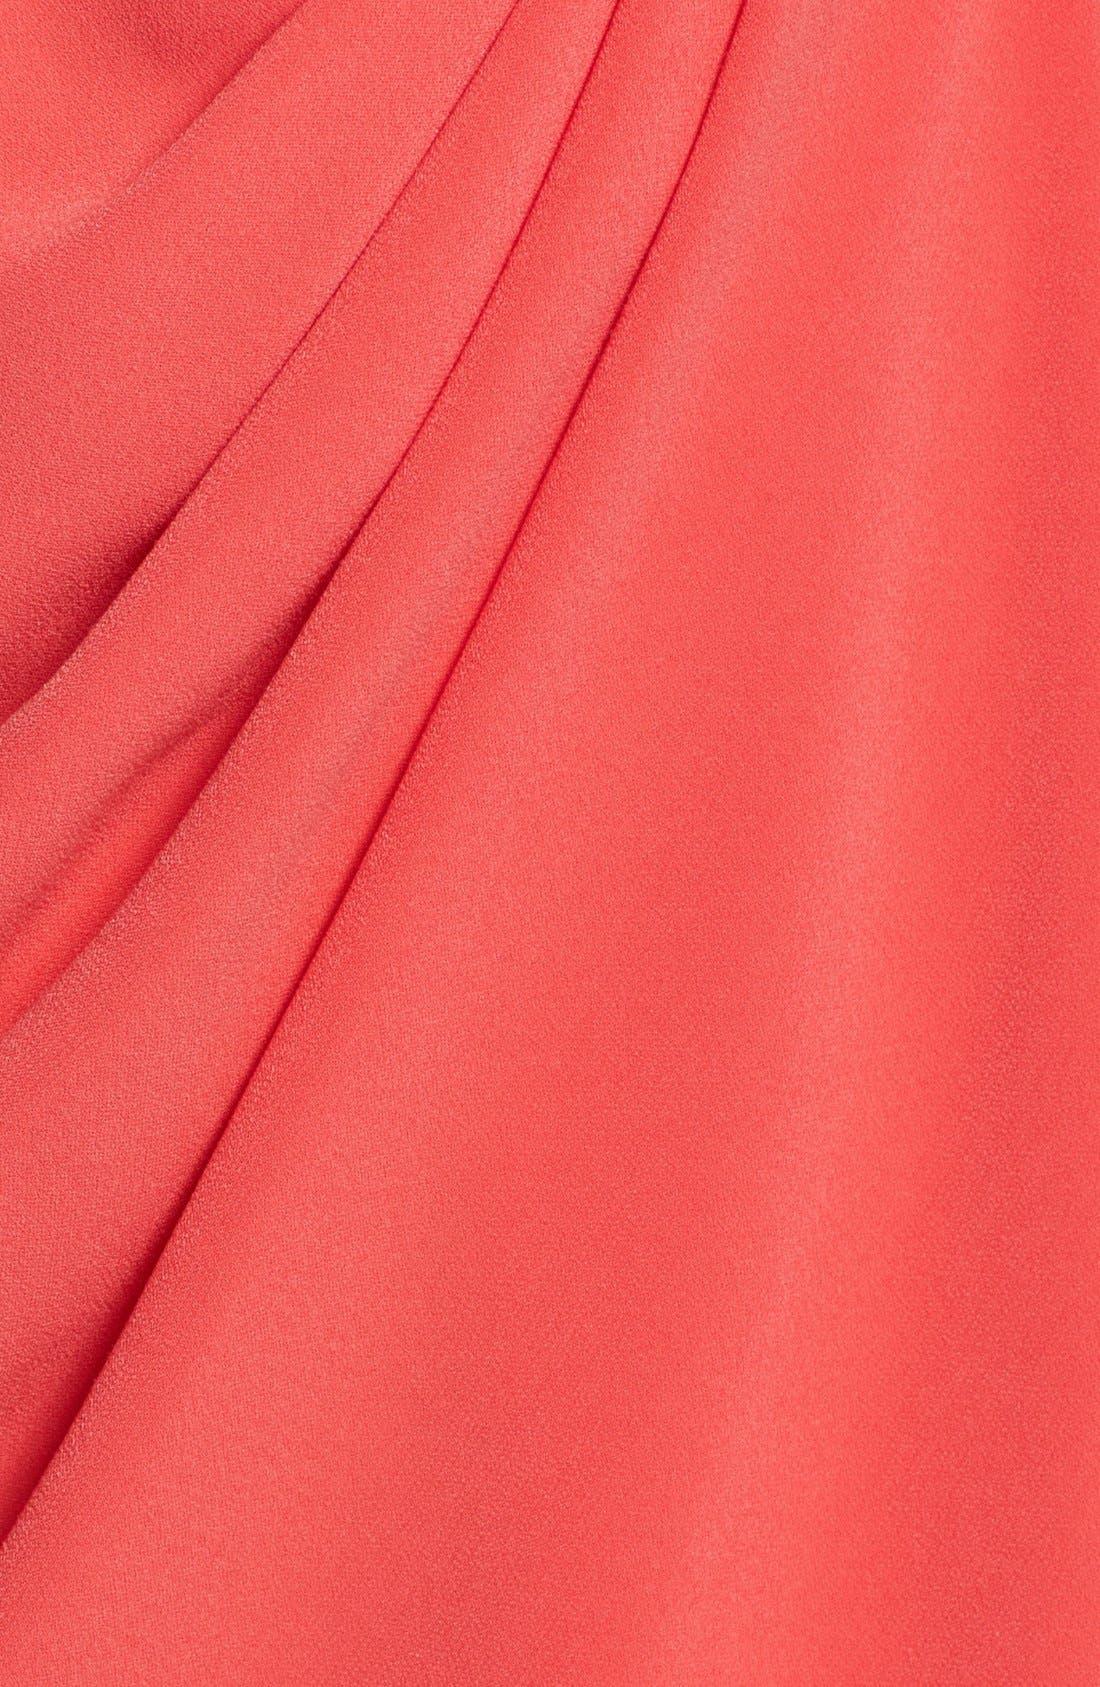 Alternate Image 3  - St. John Collection Kimono Sleeve Luxe Crepe Dress